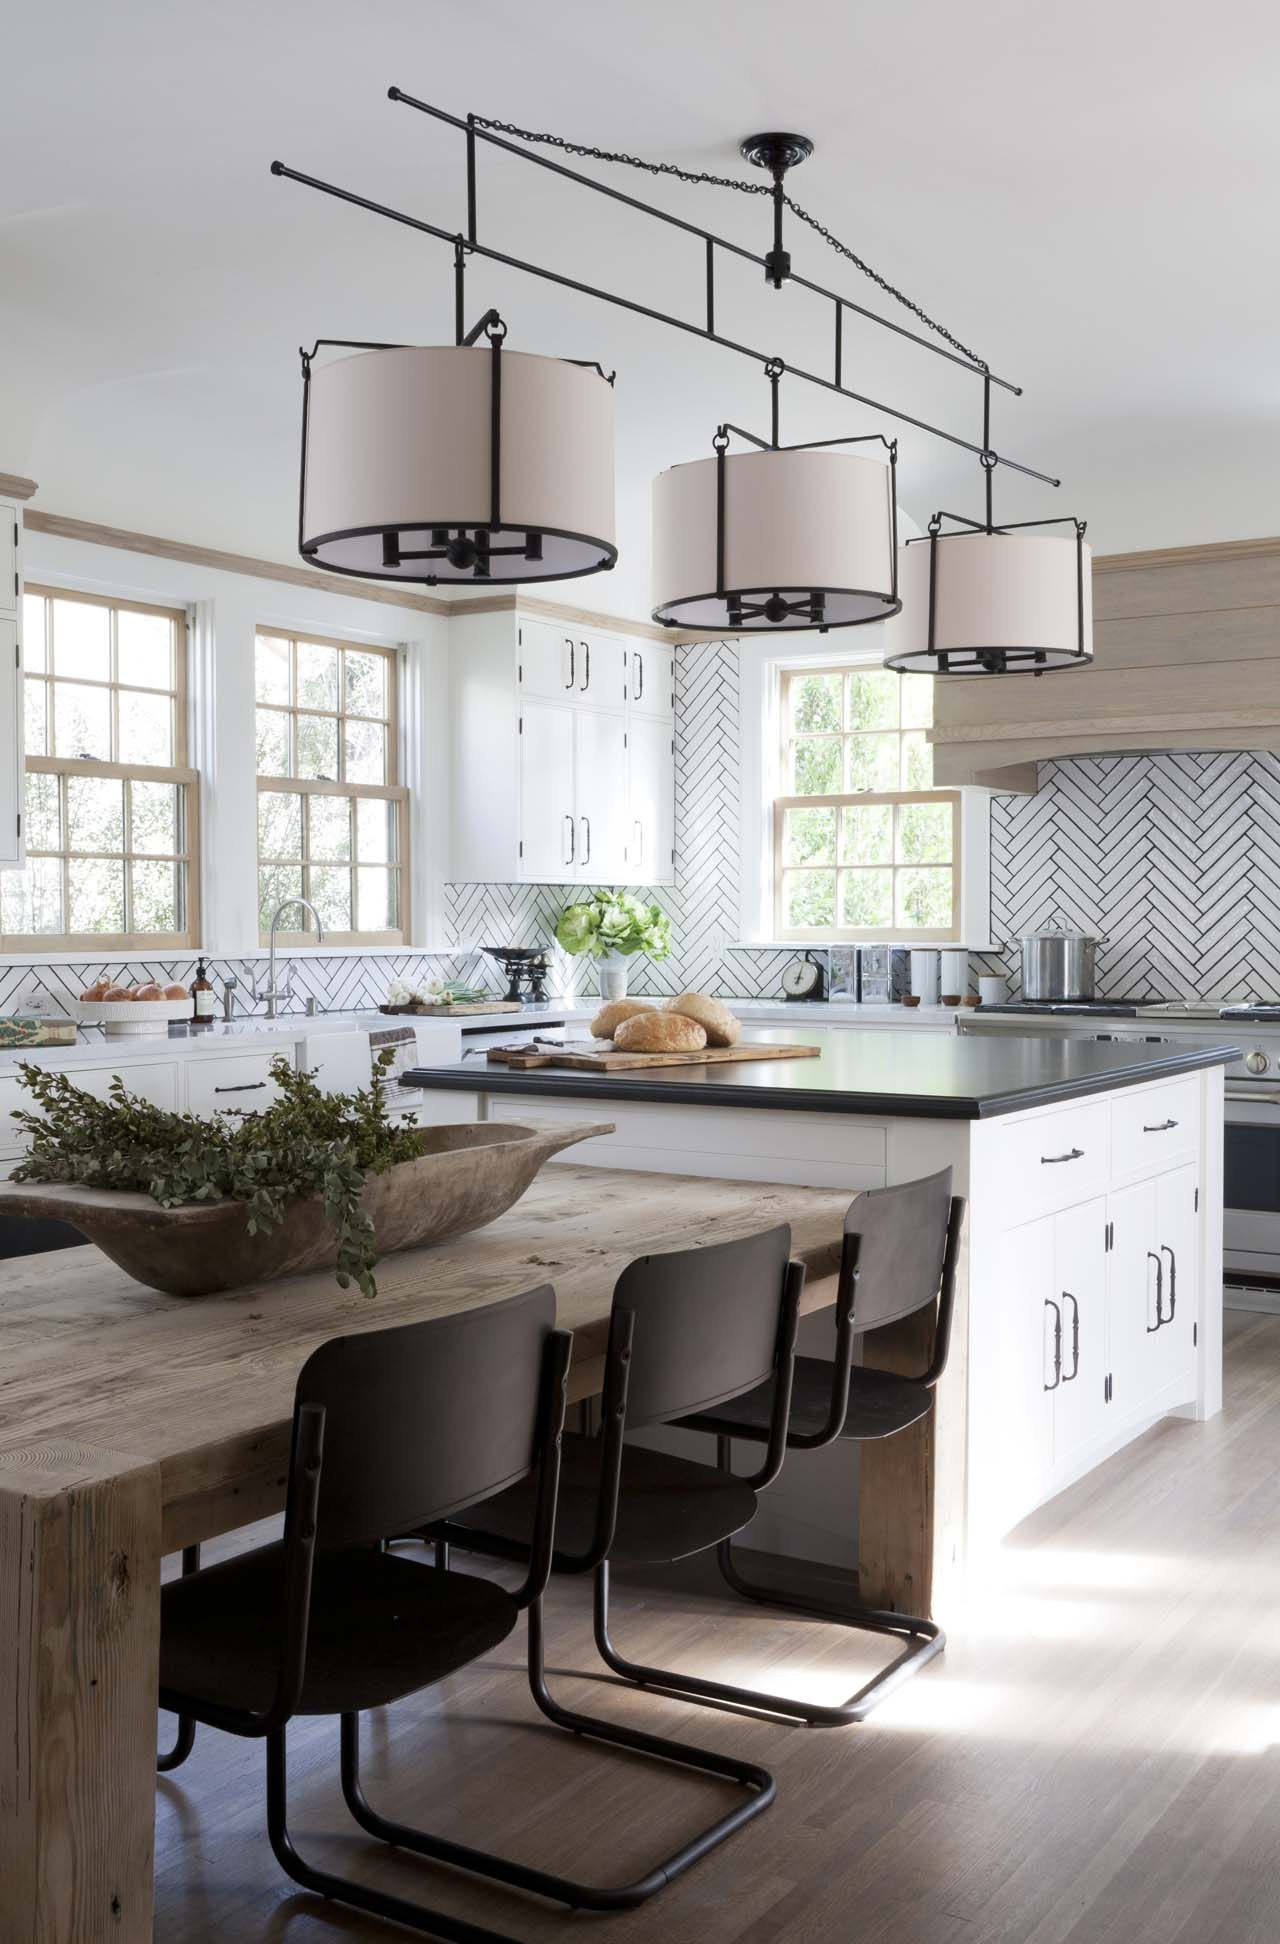 30 brilliant kitchen island ideas that make a statement kitchen island dining table kitchen on kitchen island ideas organization id=46048